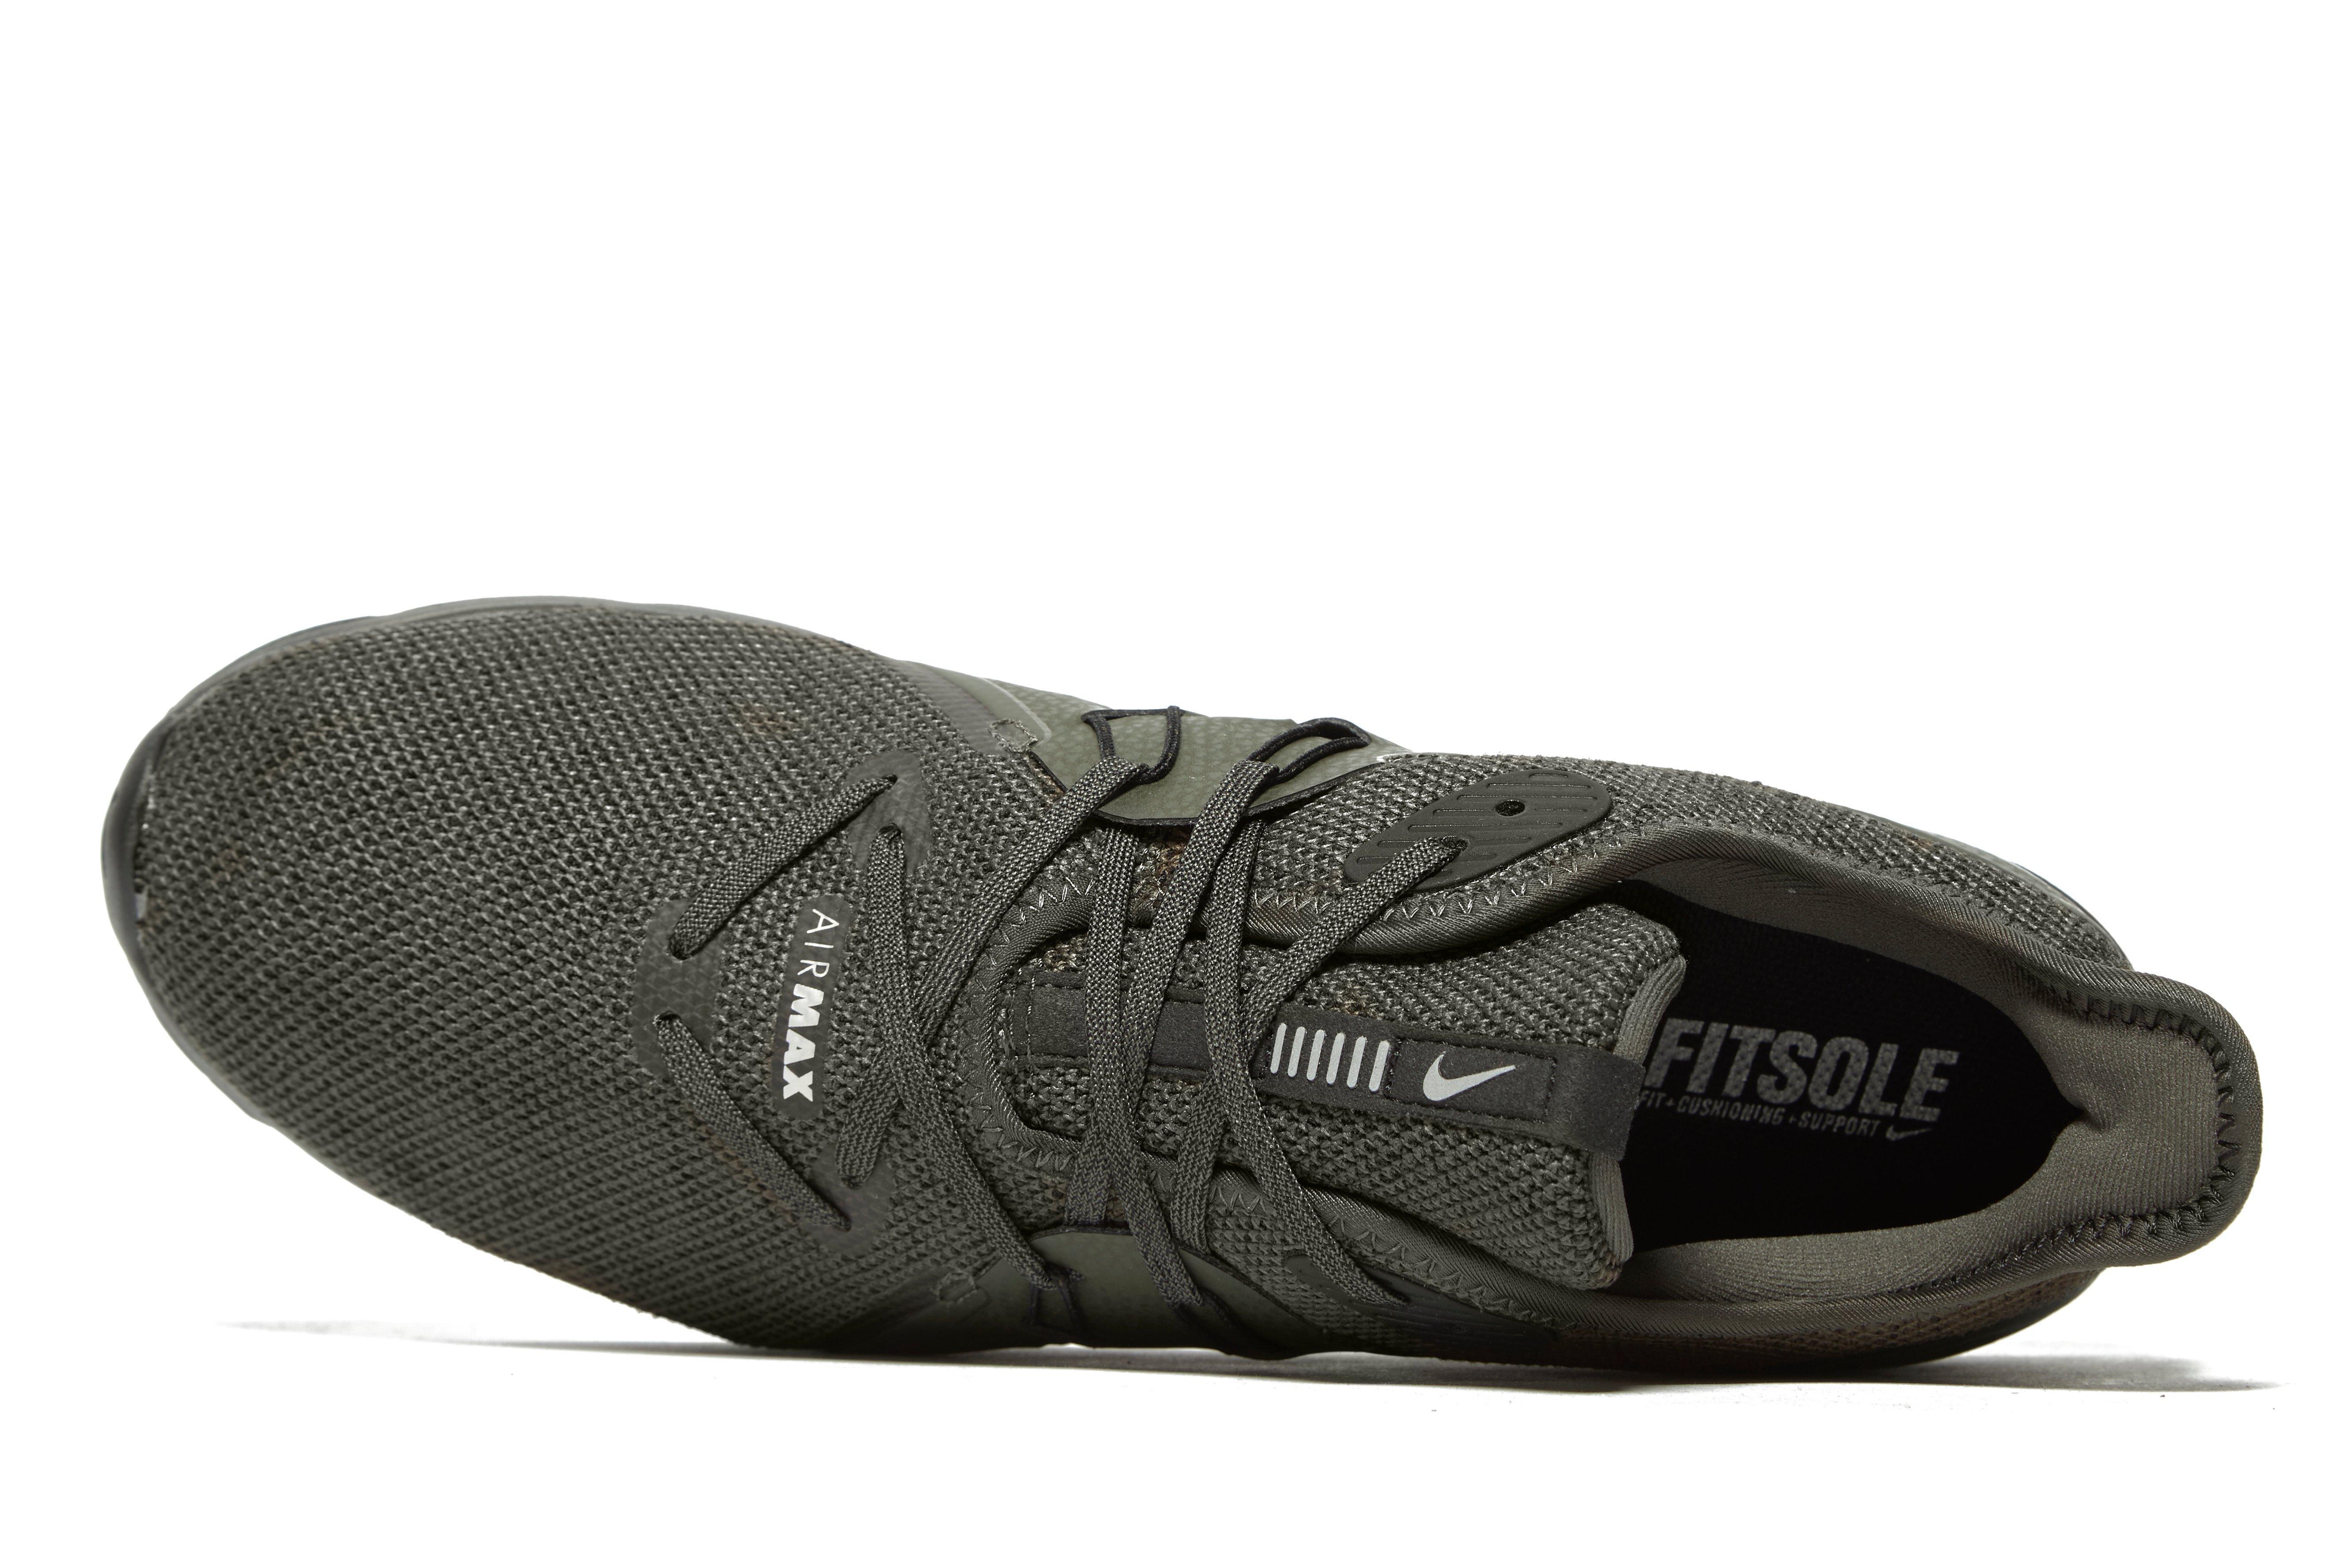 a8c580d4a9945 Men s Nike Internationalist Mid Sneakers Mens Velcro Tennis Shoes